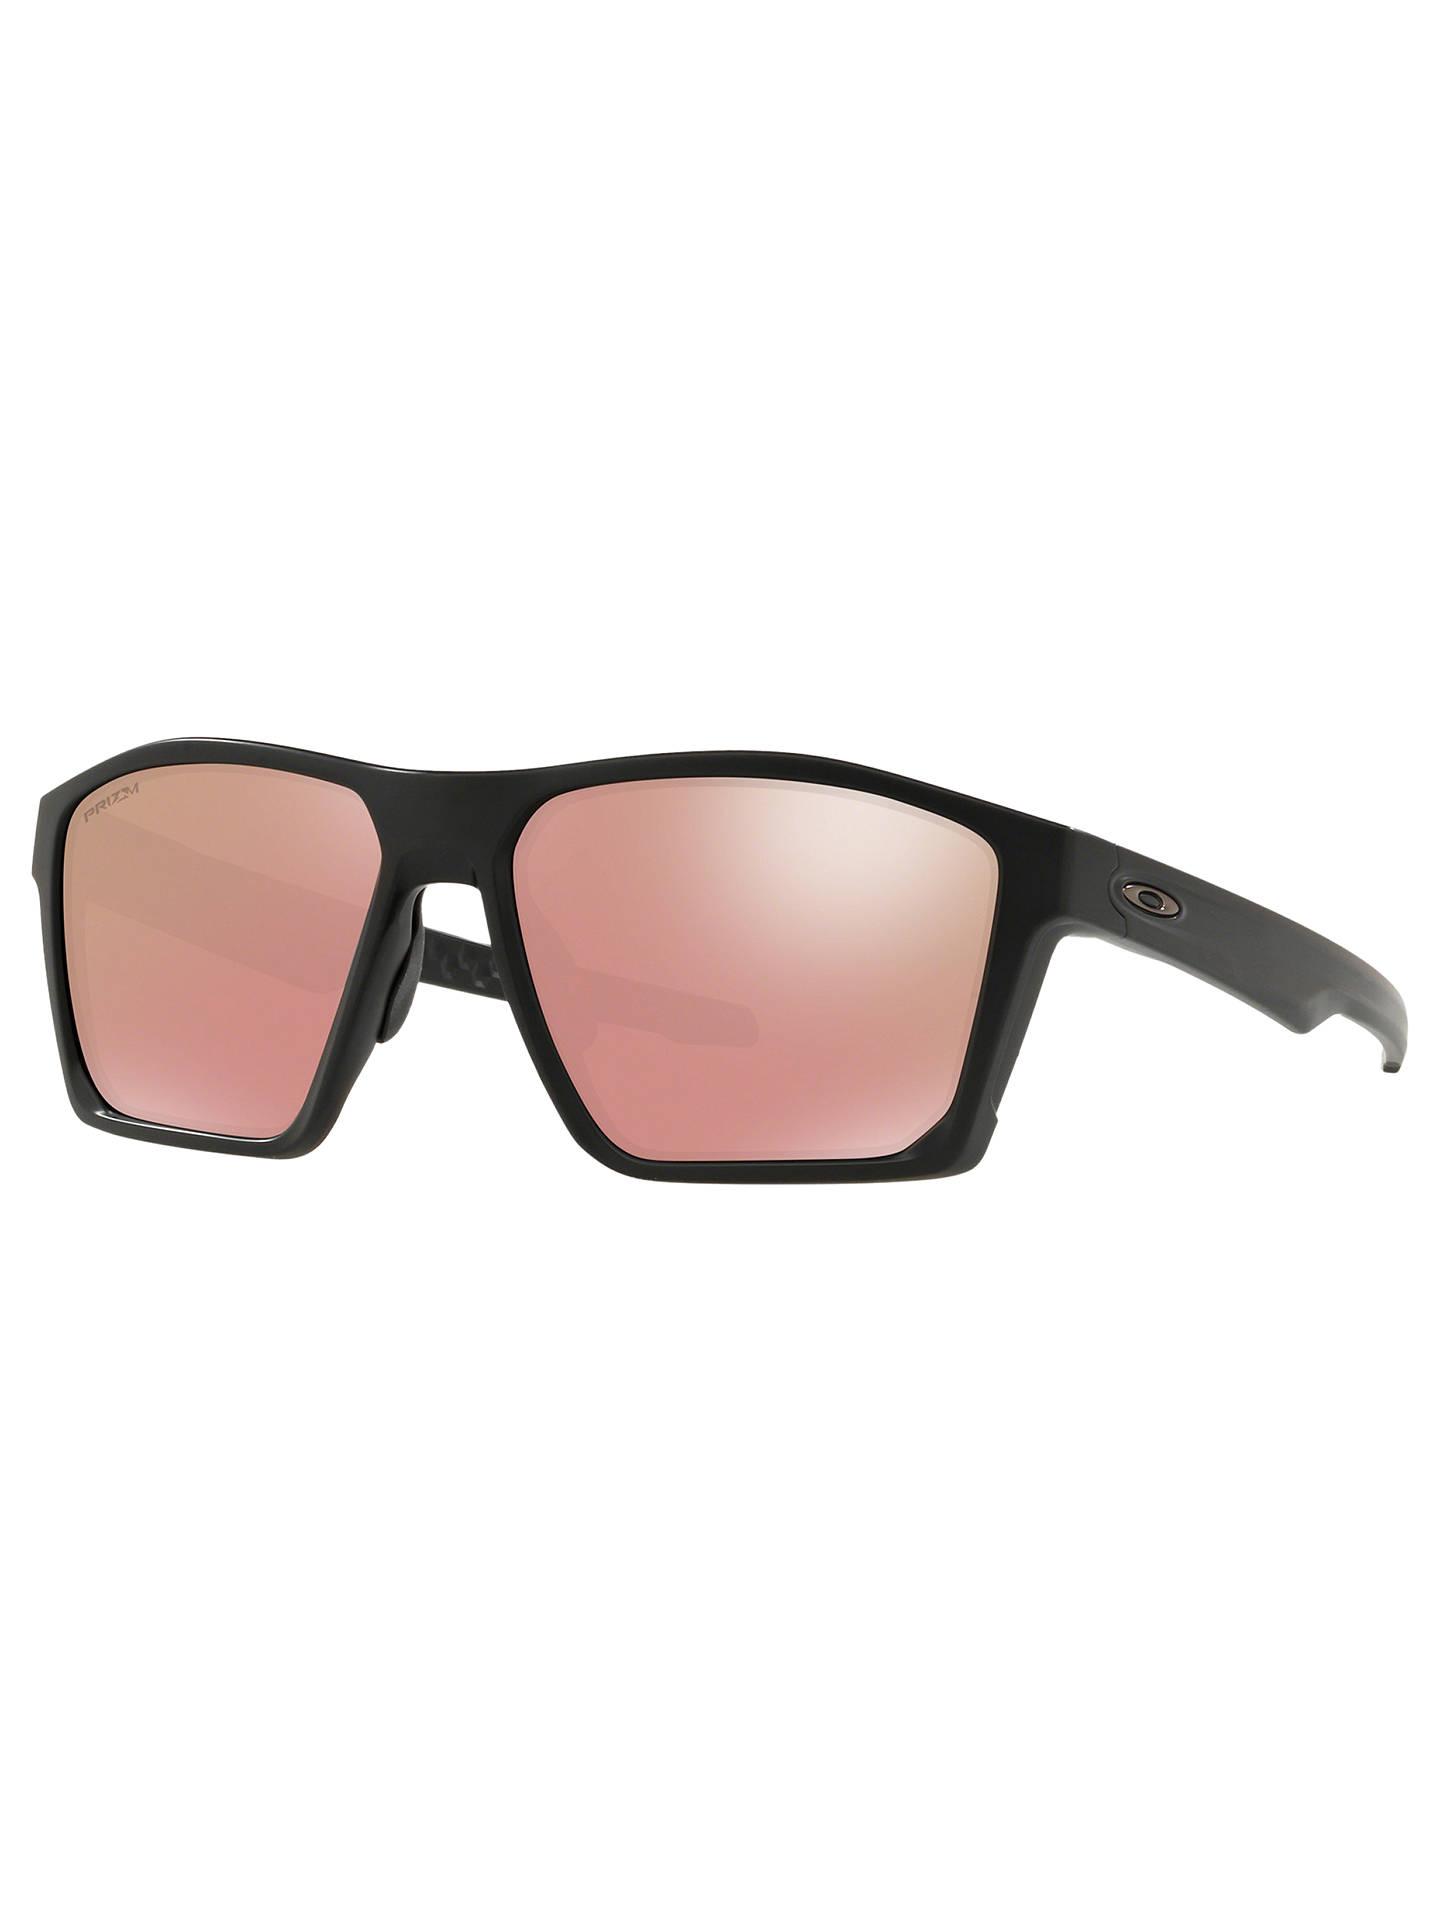 7b461dbe4f523 Buy Oakley OO9397 Targetline Men s Sunglasses